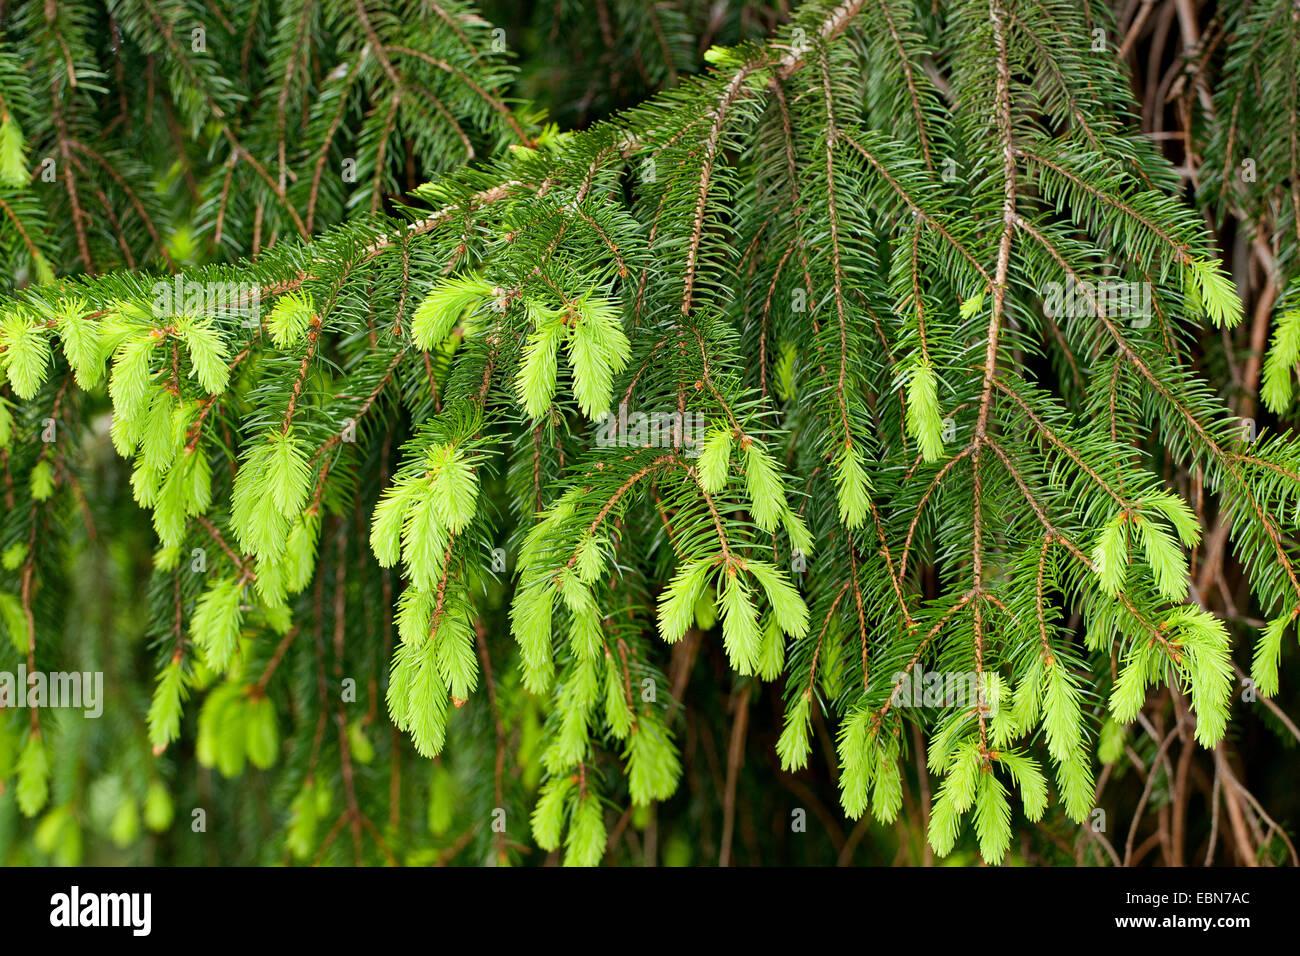 Norway spruce (Picea abies), fresh shootings, Germany - Stock Image